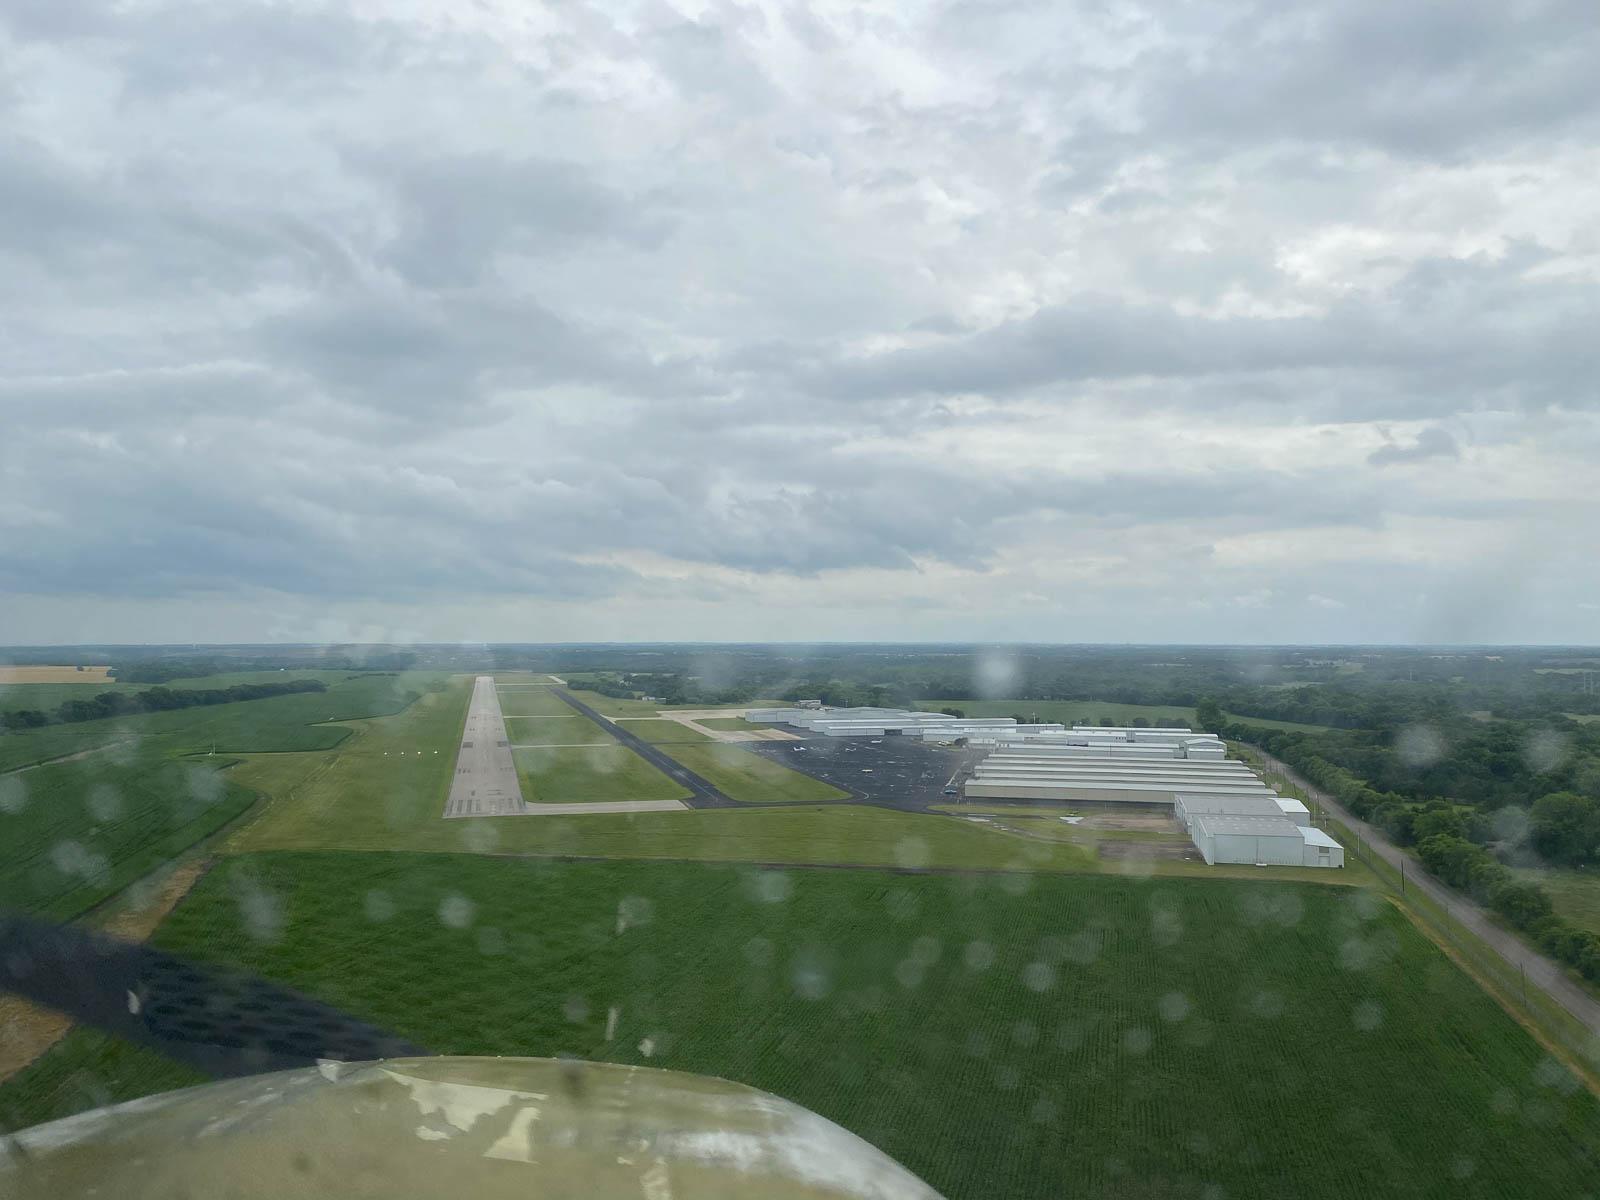 Landing near Dallas as the rain starts